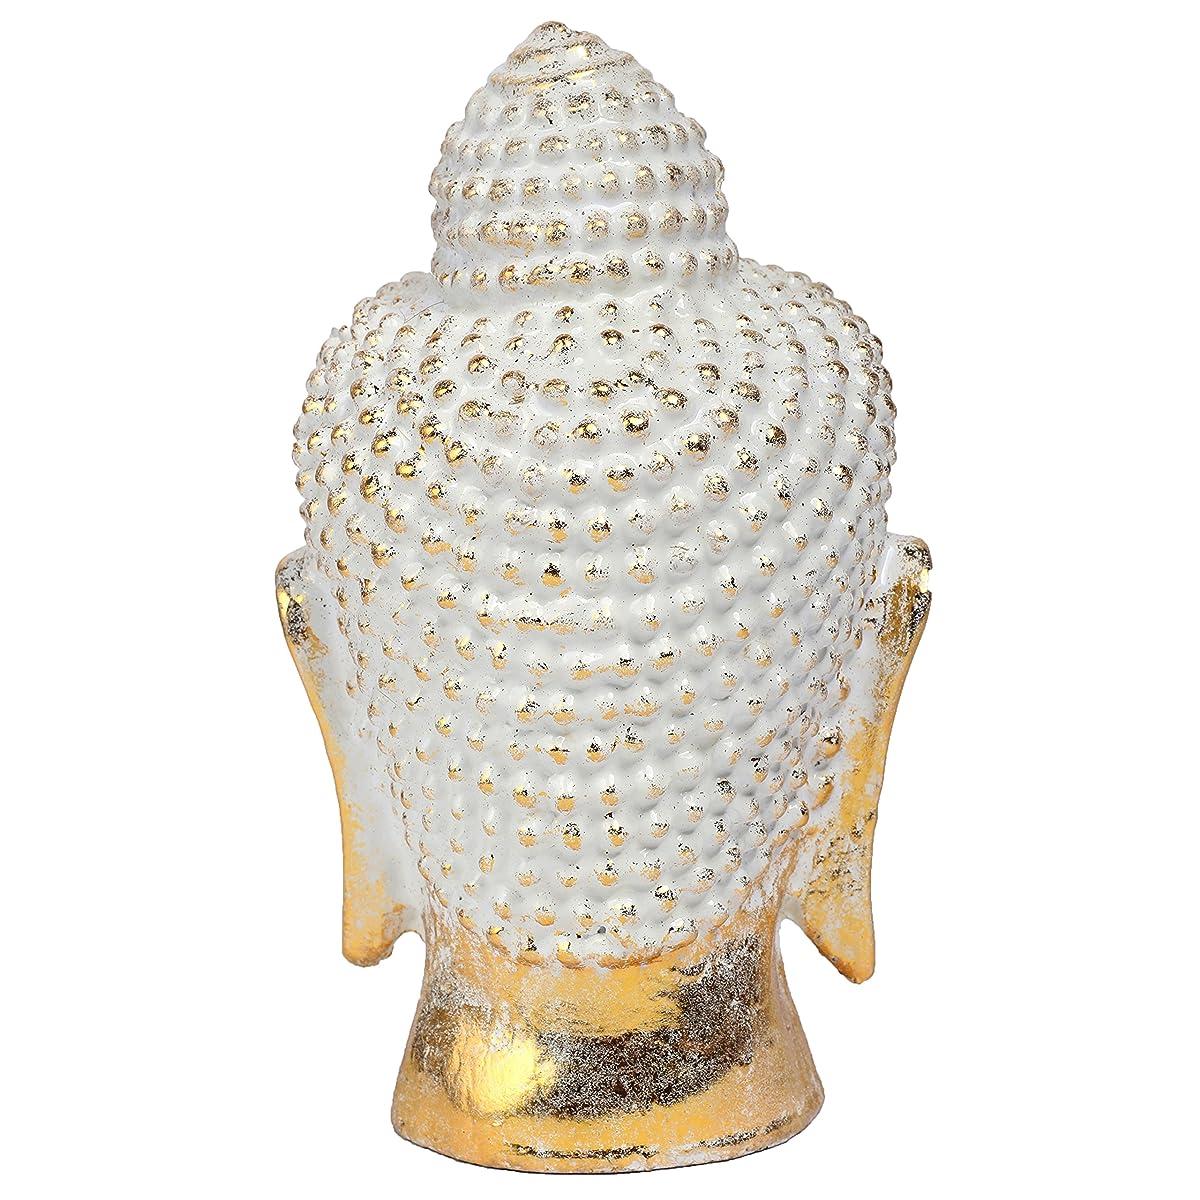 MyGift 8-Inch Vintage Rustic Gold Resin Meditating Buddha Head Decorative Statue Sculpture